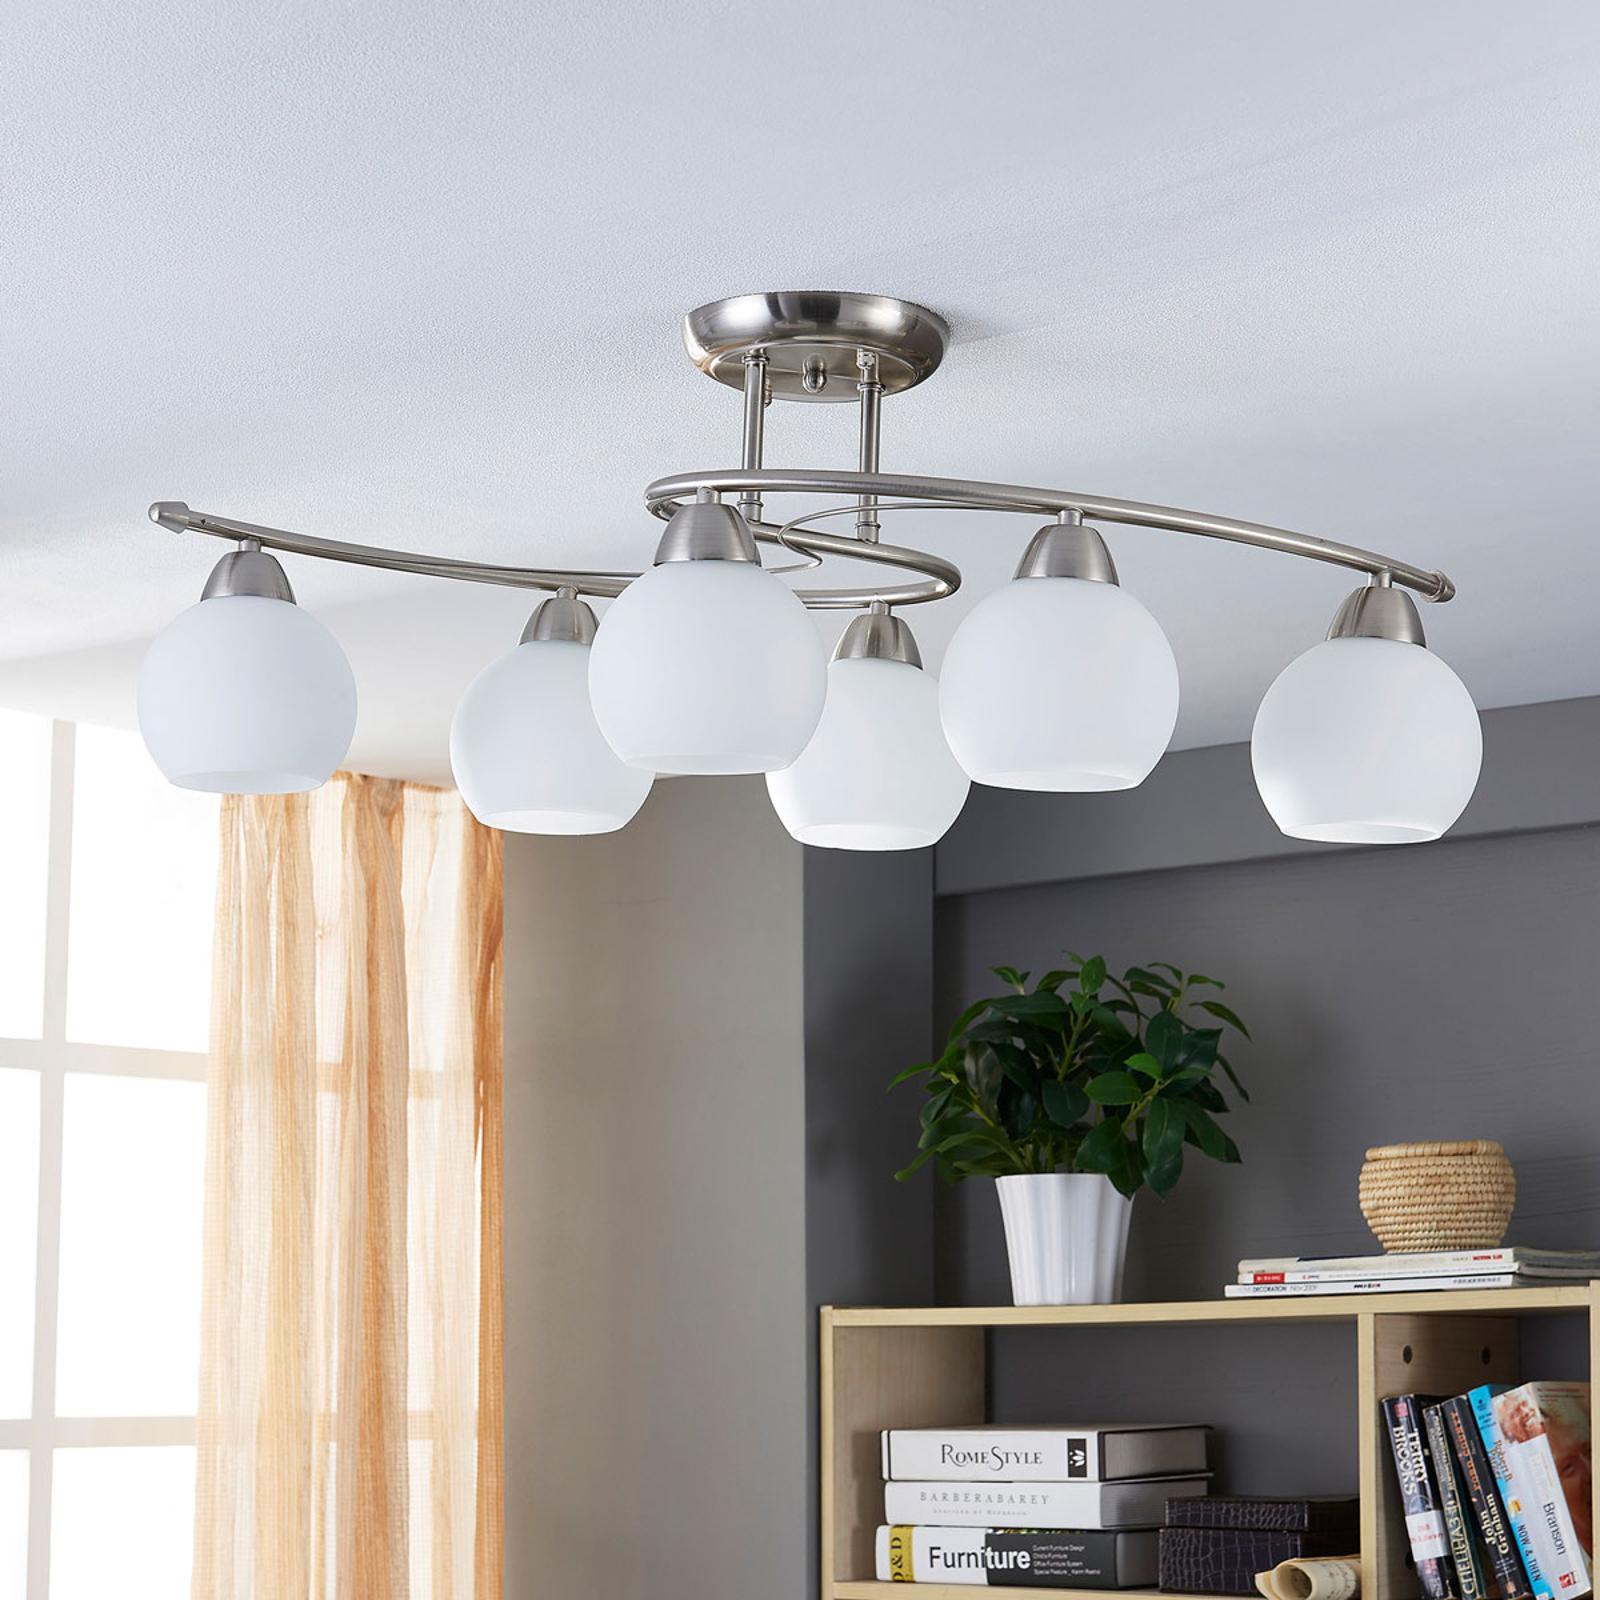 Dining Room Ceiling Light Svean 6 Bulbs Lights Co Uk